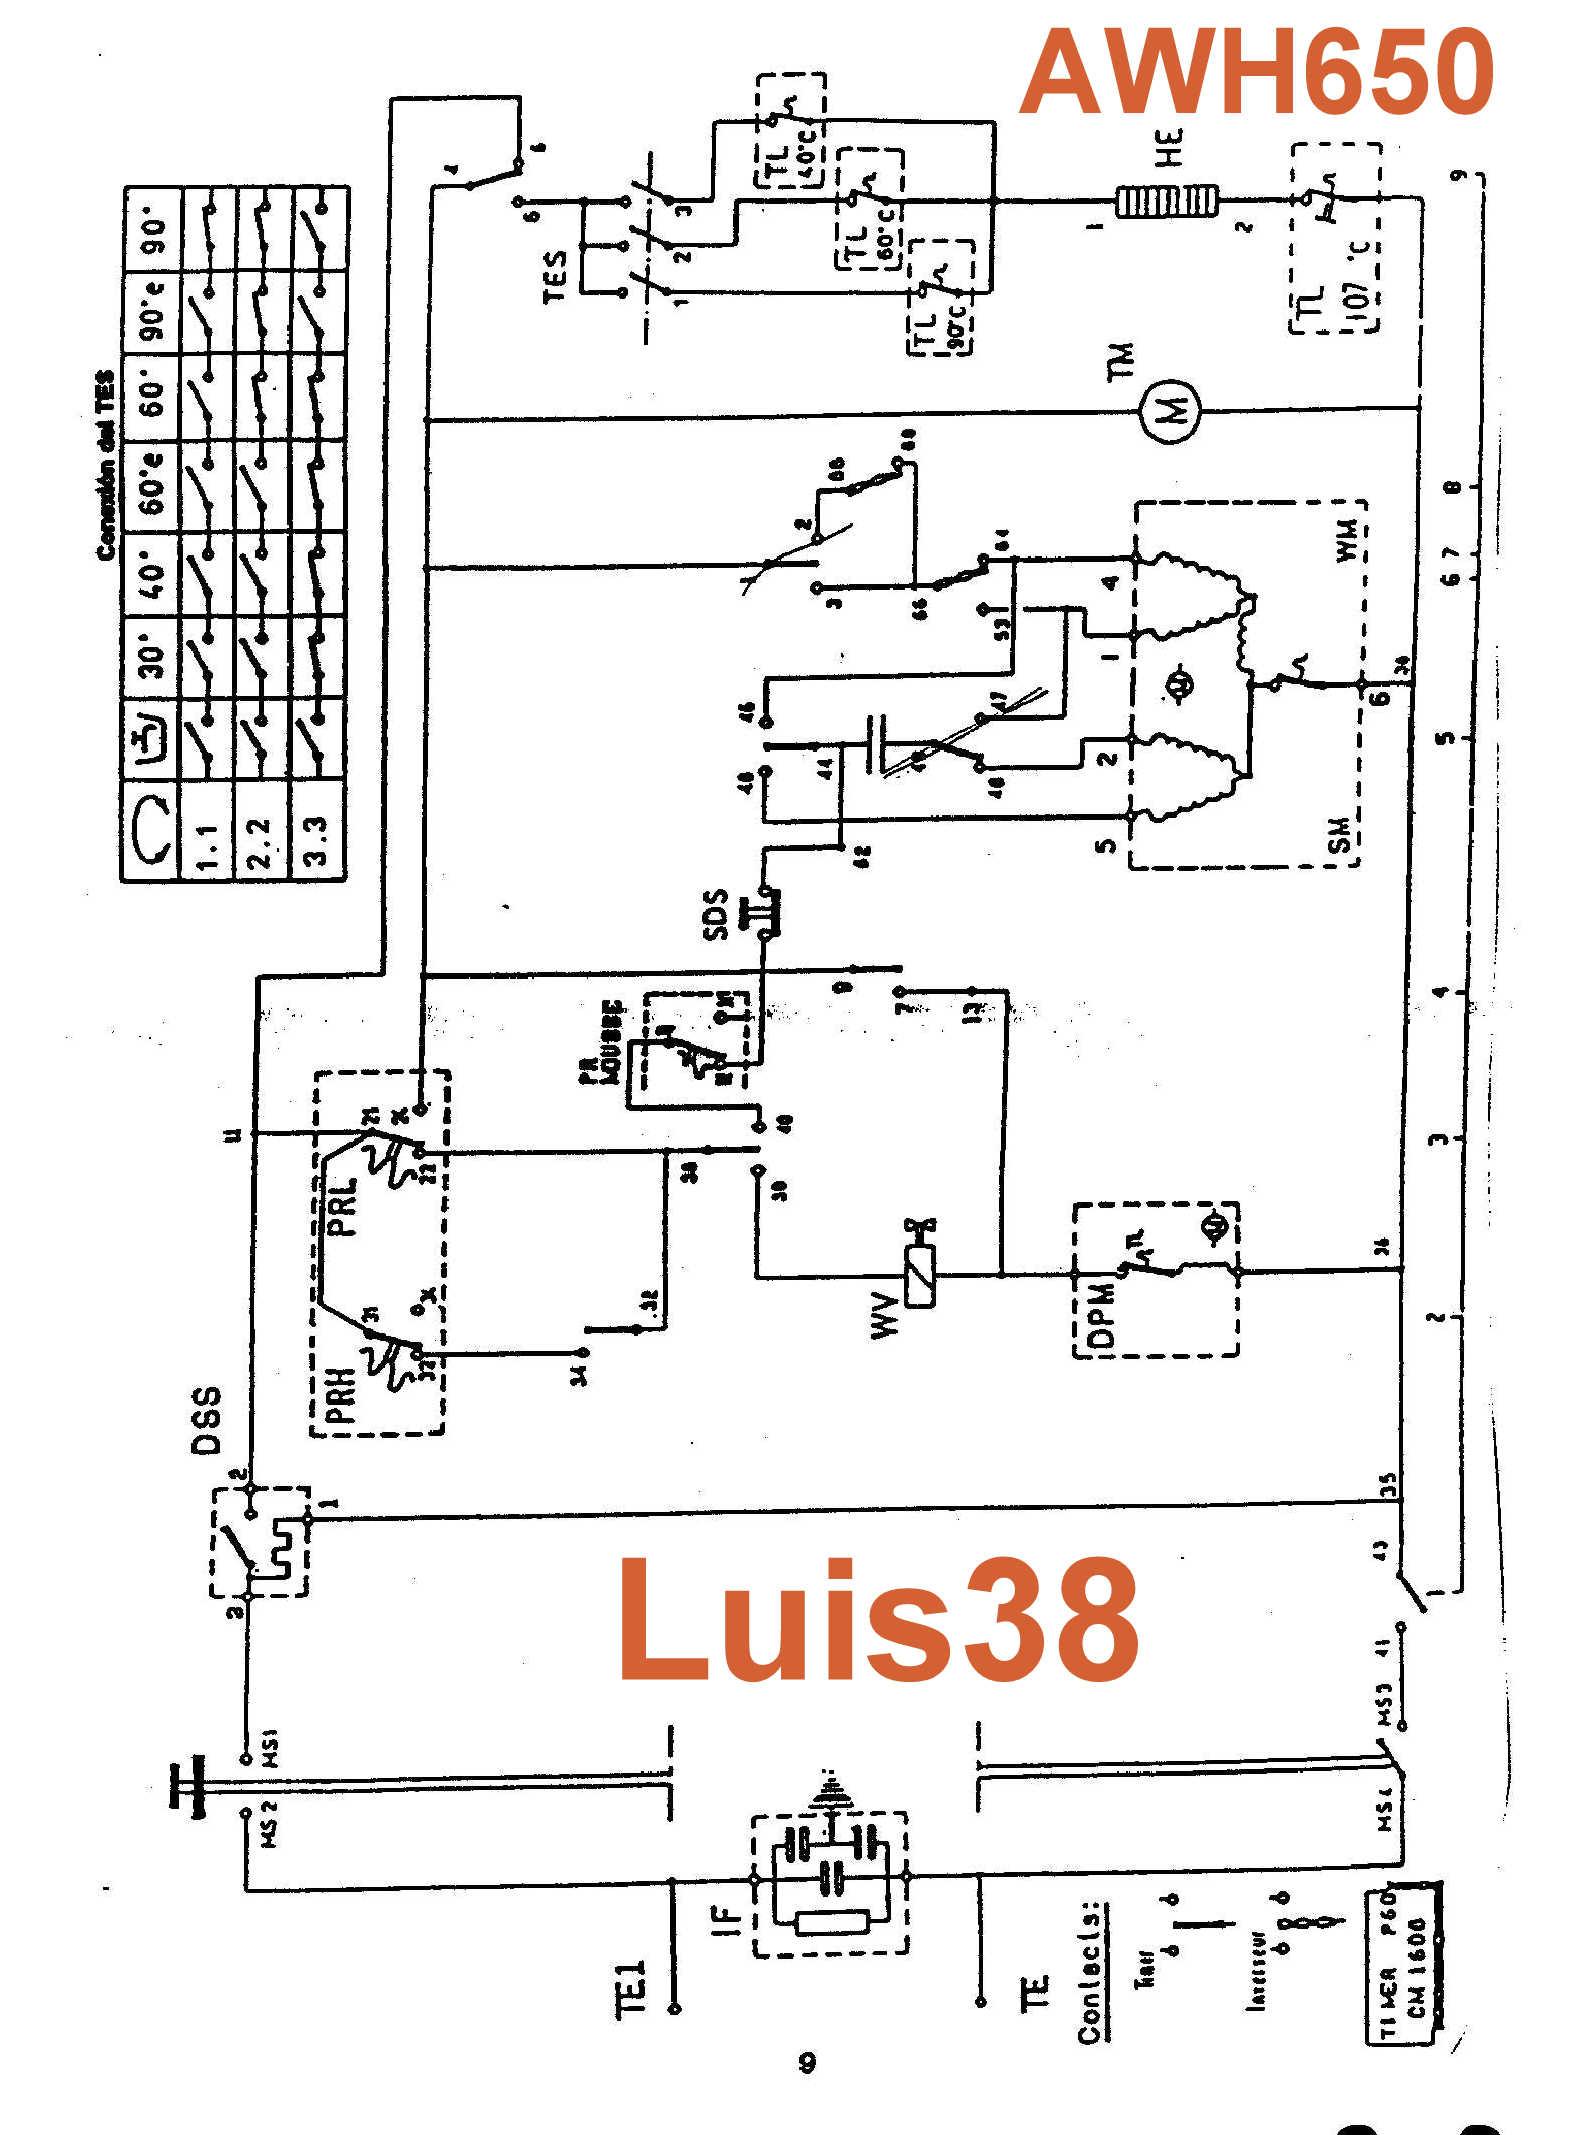 solucionado  lavarropas eslabon de lujo modelo awh650  no lava en princip